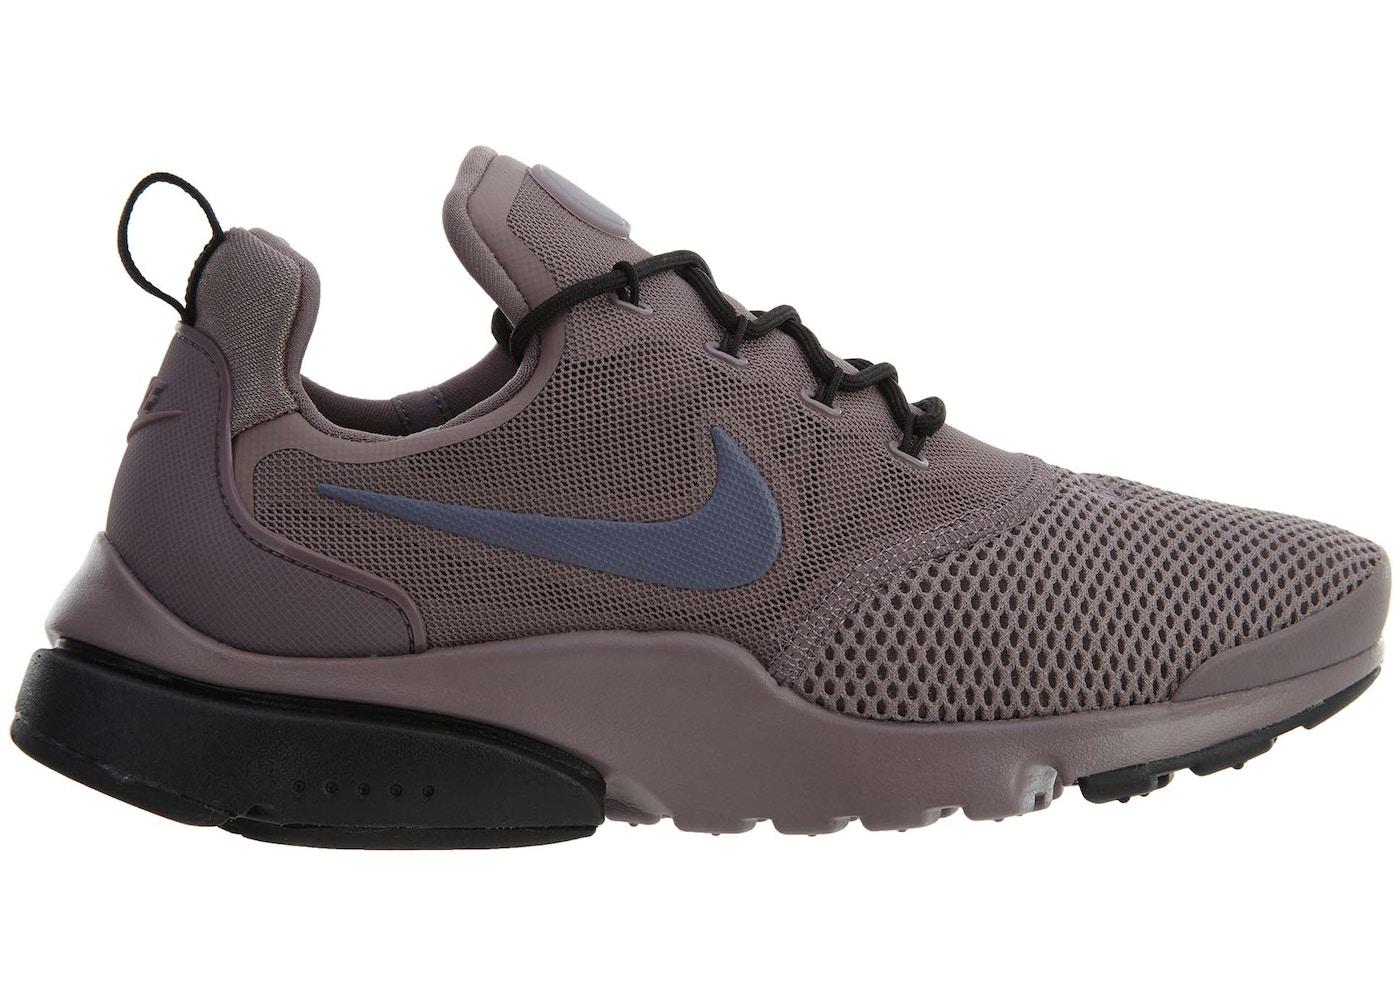 low priced 484b4 07485 Nike Presto Fly Taupe Grey Light Carbon-Black (W) - 910569-200